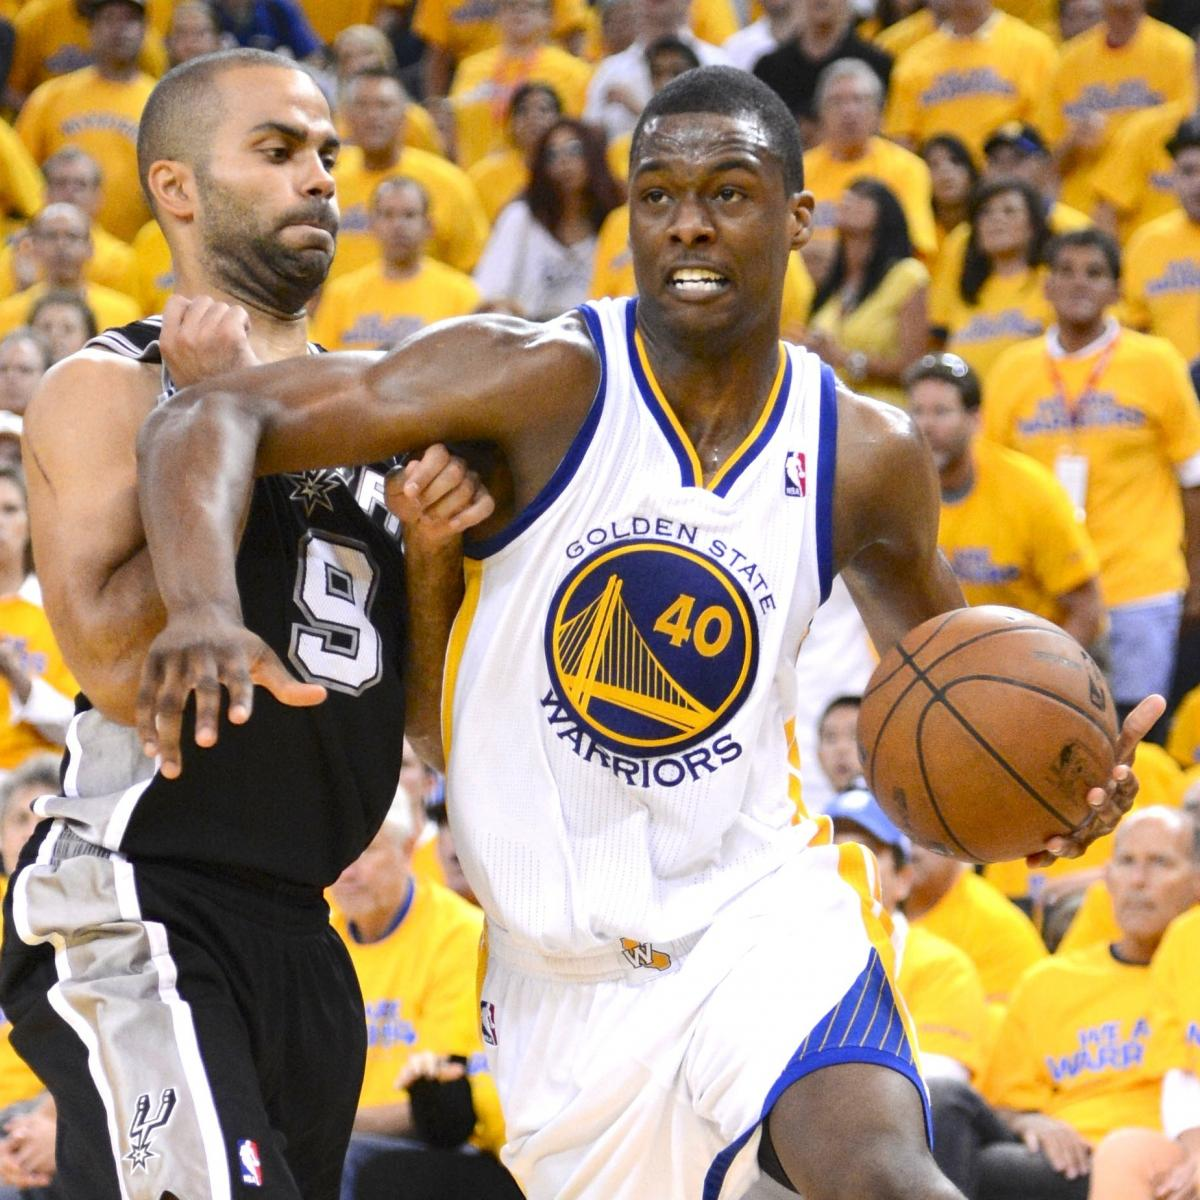 Harrison Barnes Nba: Harrison Barnes Is NBA Postseason's Rookie Of The Year